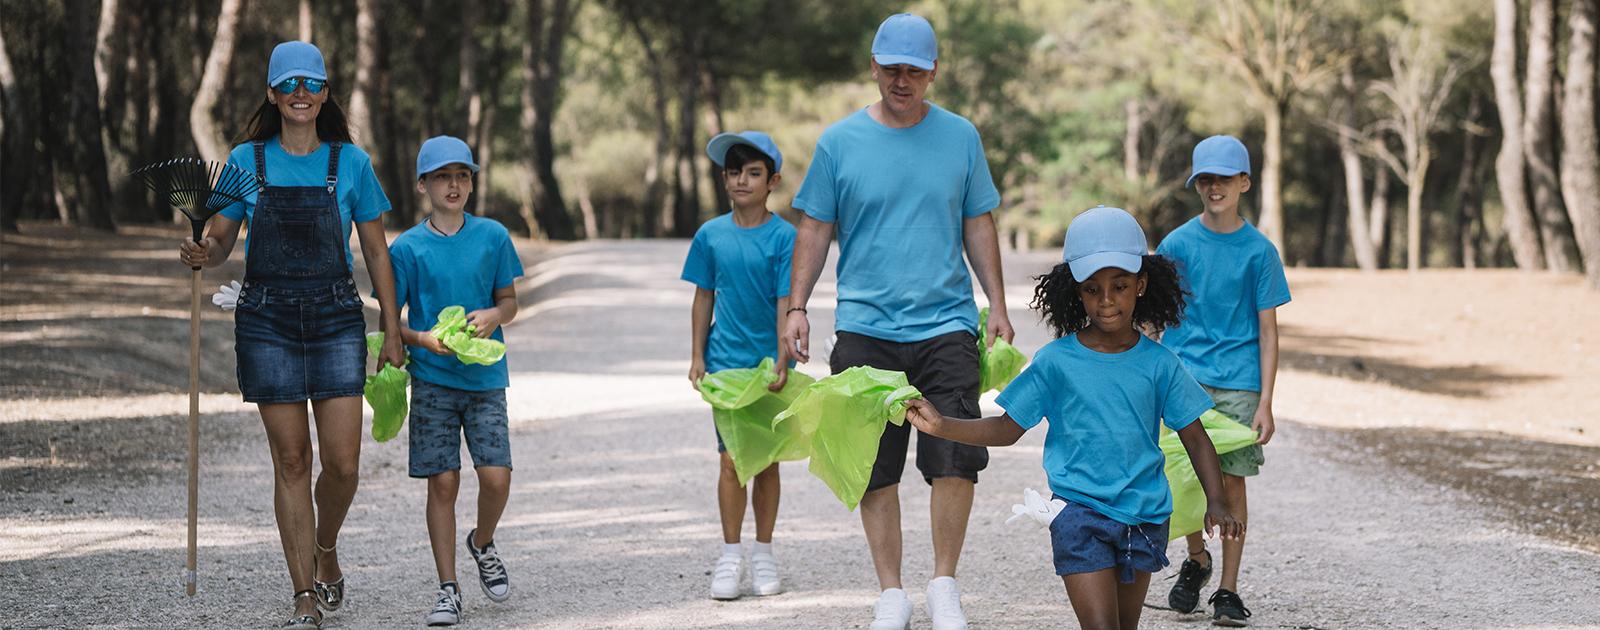 Clean running en famille !